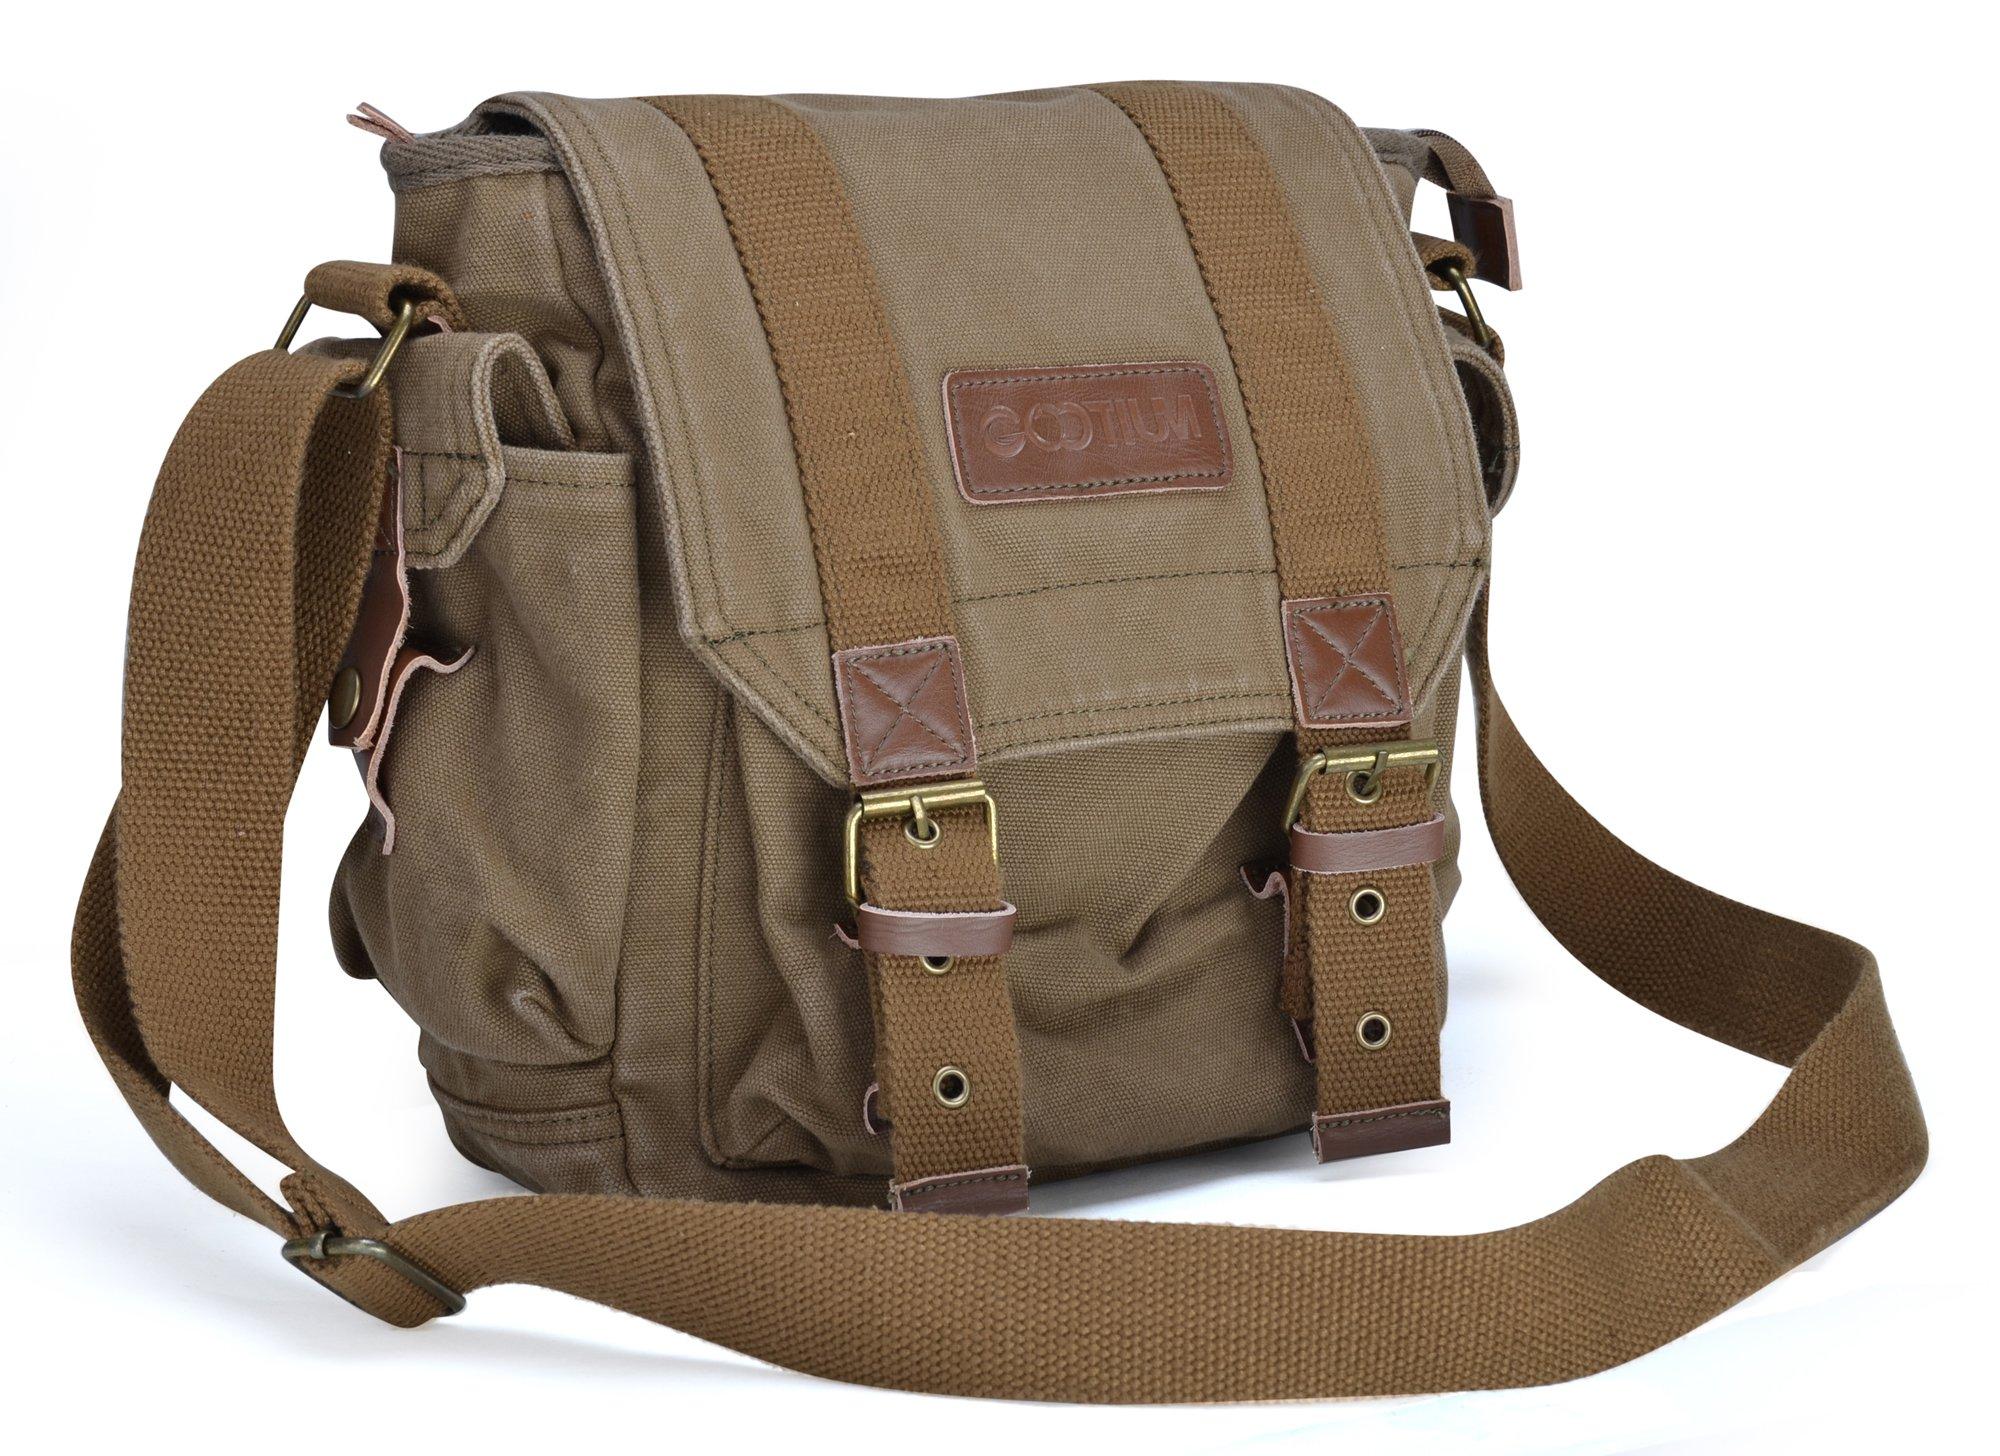 Gootium Canvas Messenger Bag - Small Vintage Shoulder Bag Crossbody Satchel, Army Green by Gootium